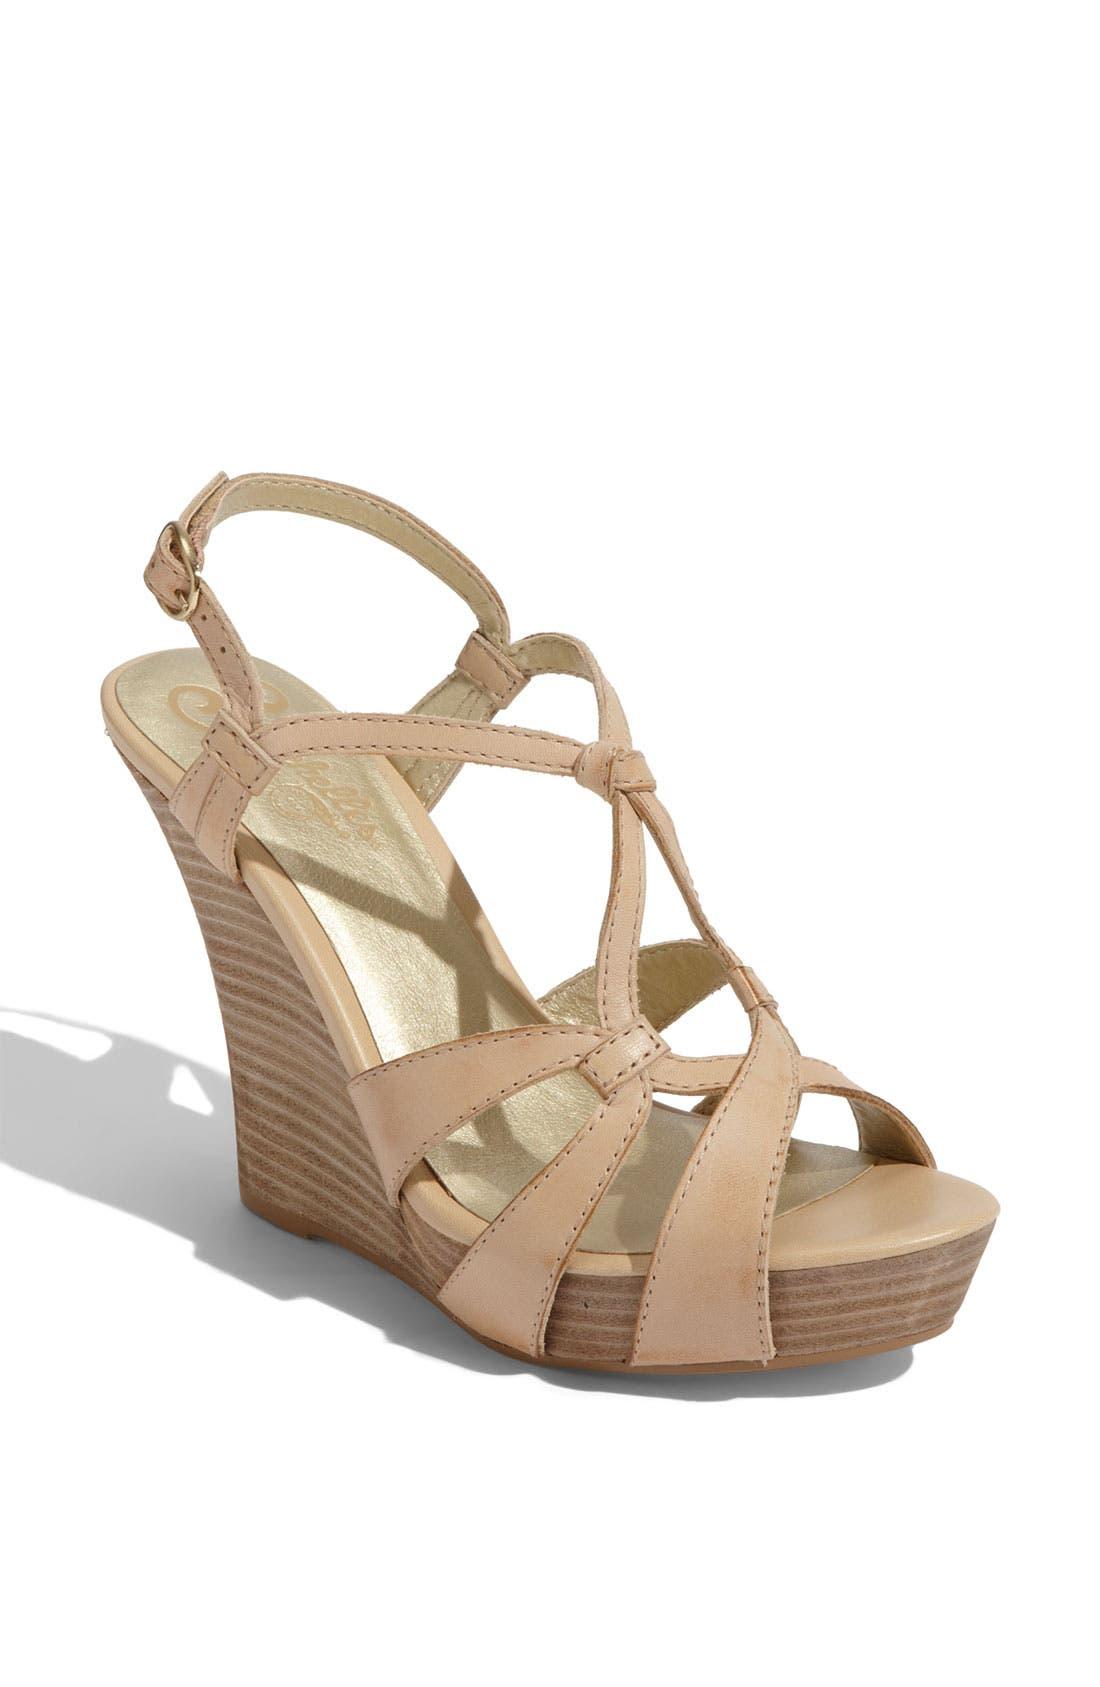 'Purr' Wedge Sandal,                             Main thumbnail 2, color,